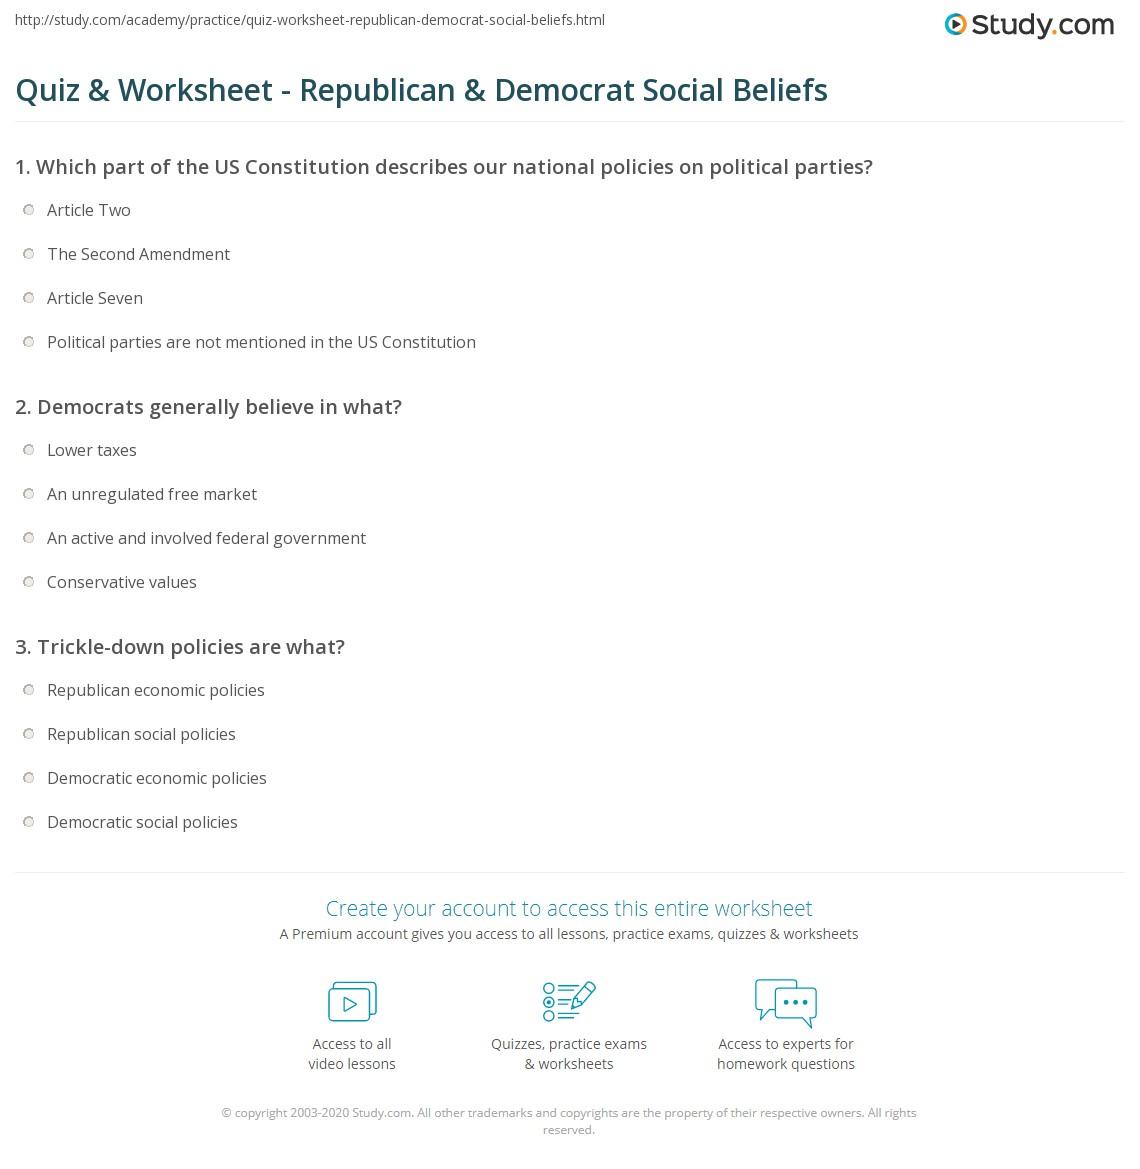 photograph relating to Democrat or Republican Quiz for Students Printable referred to as Quiz Worksheet - Republican Democrat Social Ideals